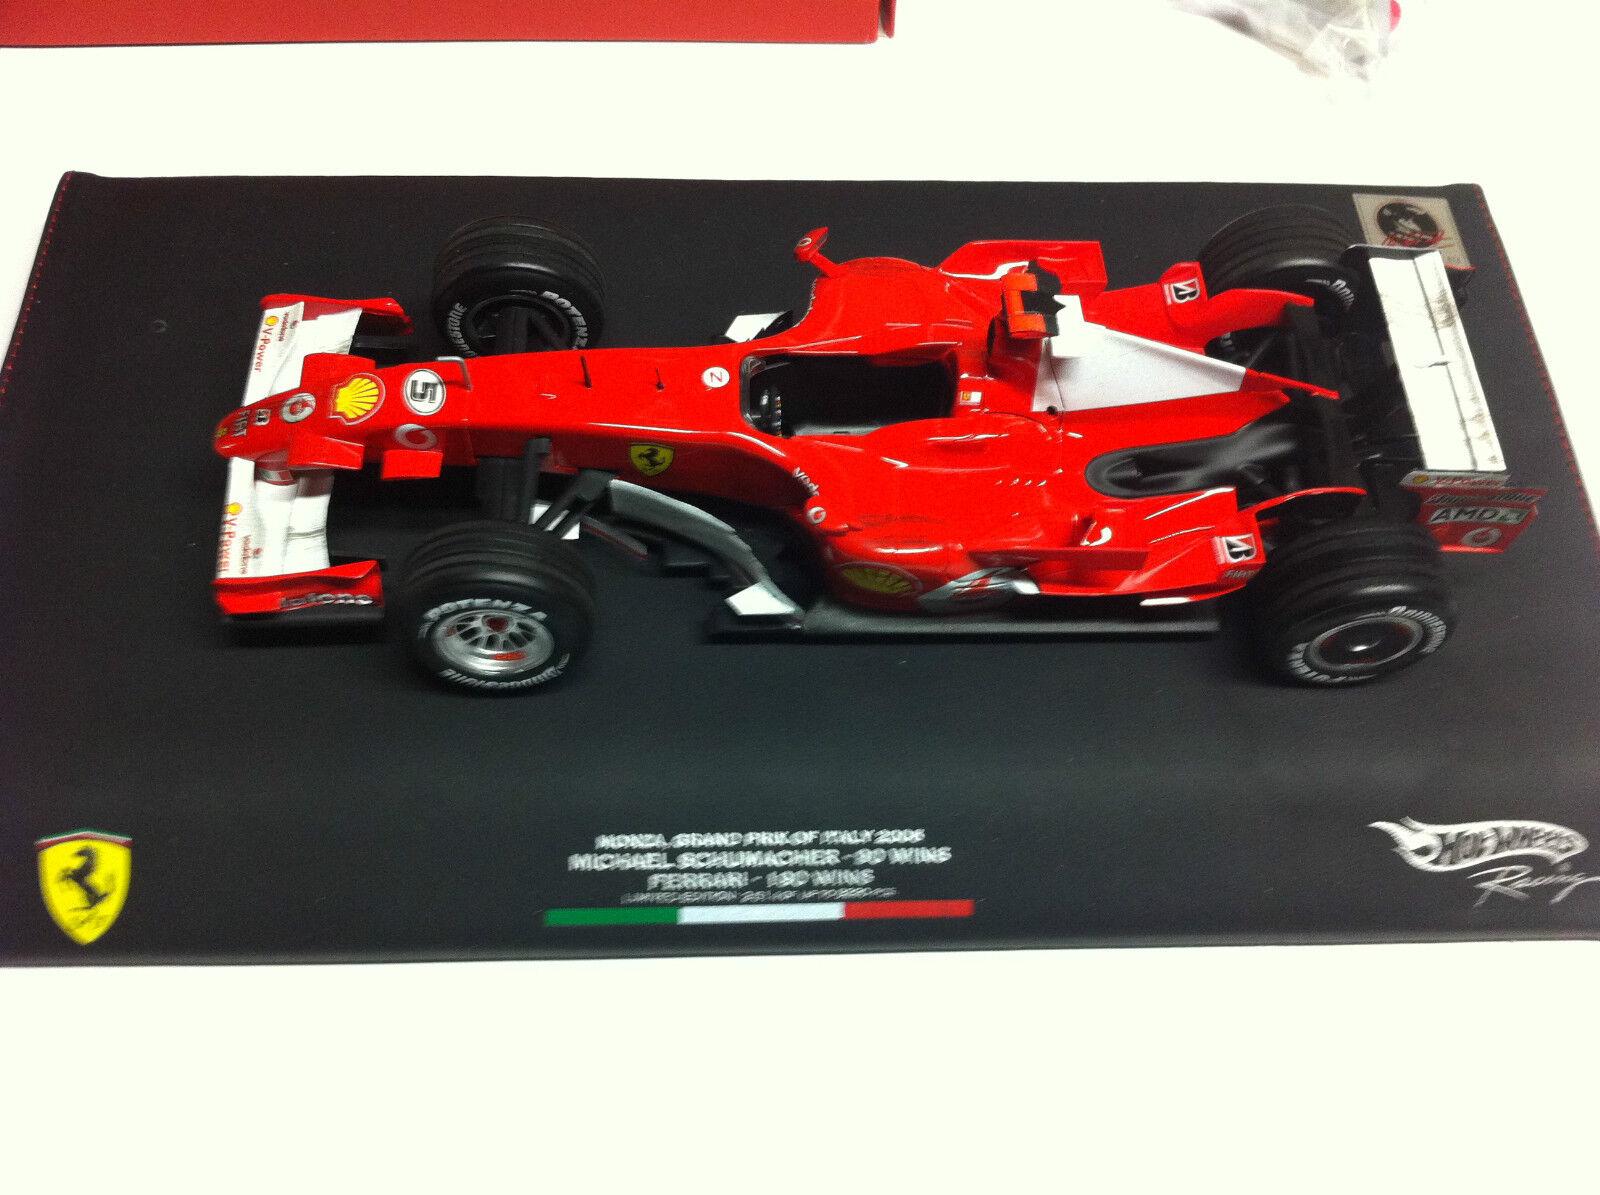 Hot Wheels 2006 M. Schumacher Ferrari Monza 90 Wins Signed Signed Signed Figurine 1 18 222